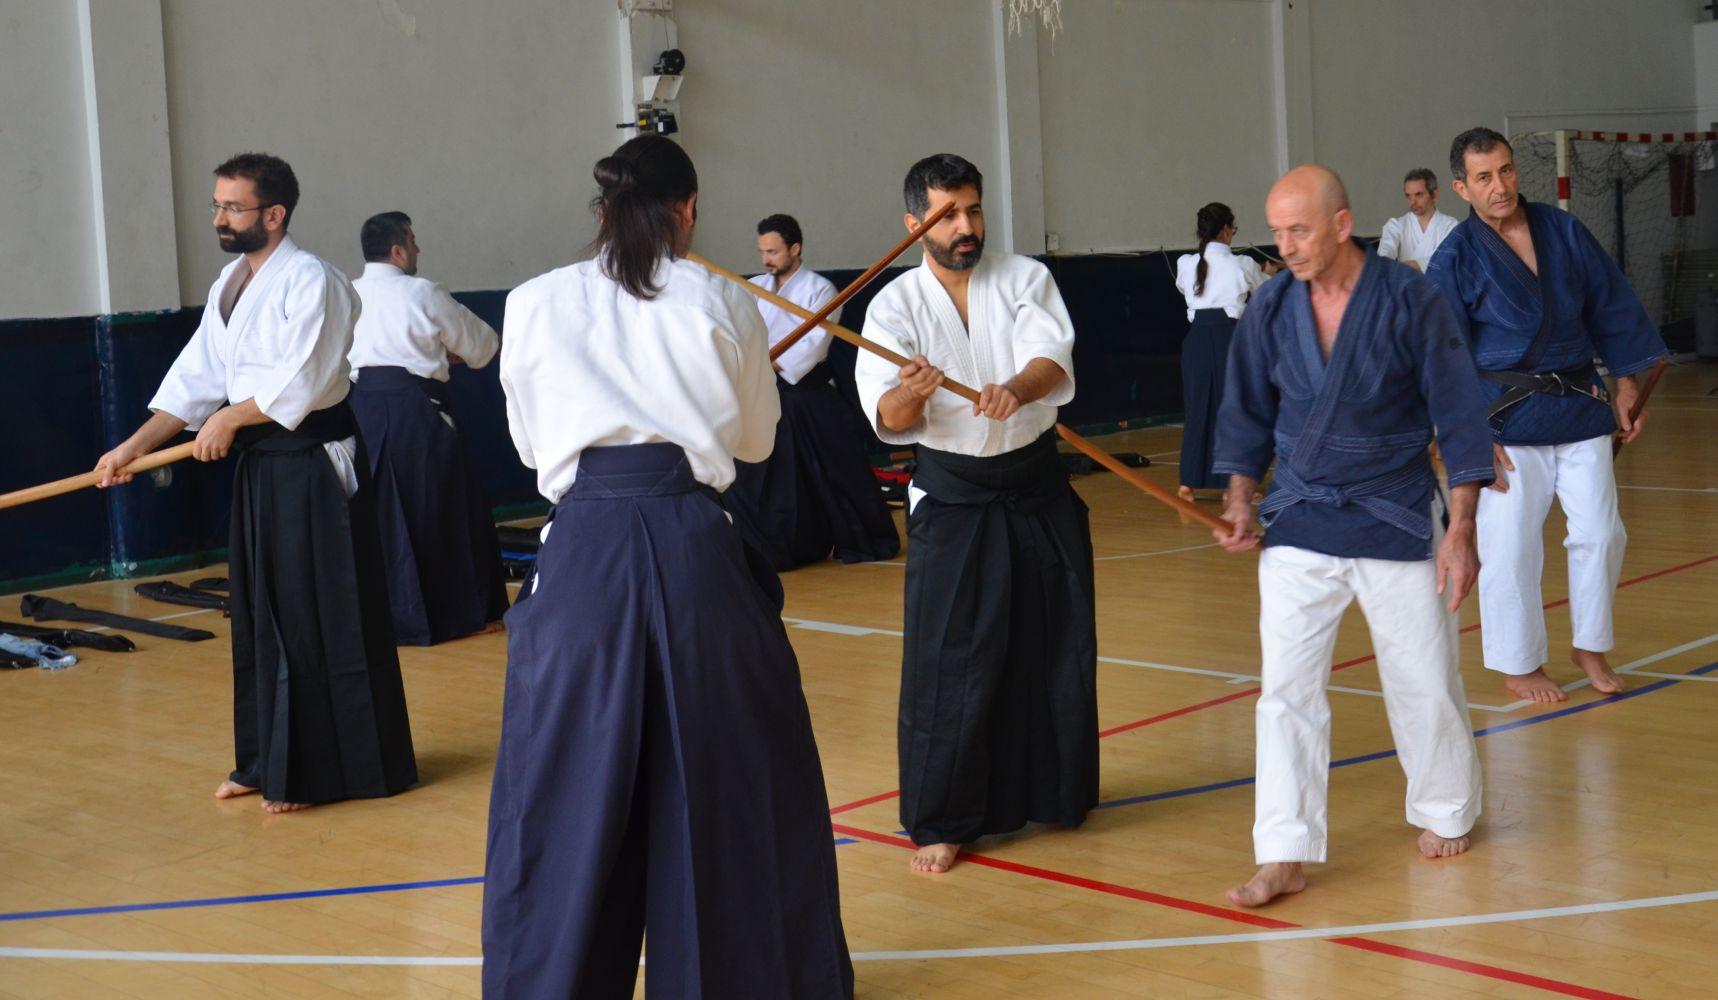 Nebi Vural İstanbul Instructor Seminar 2019